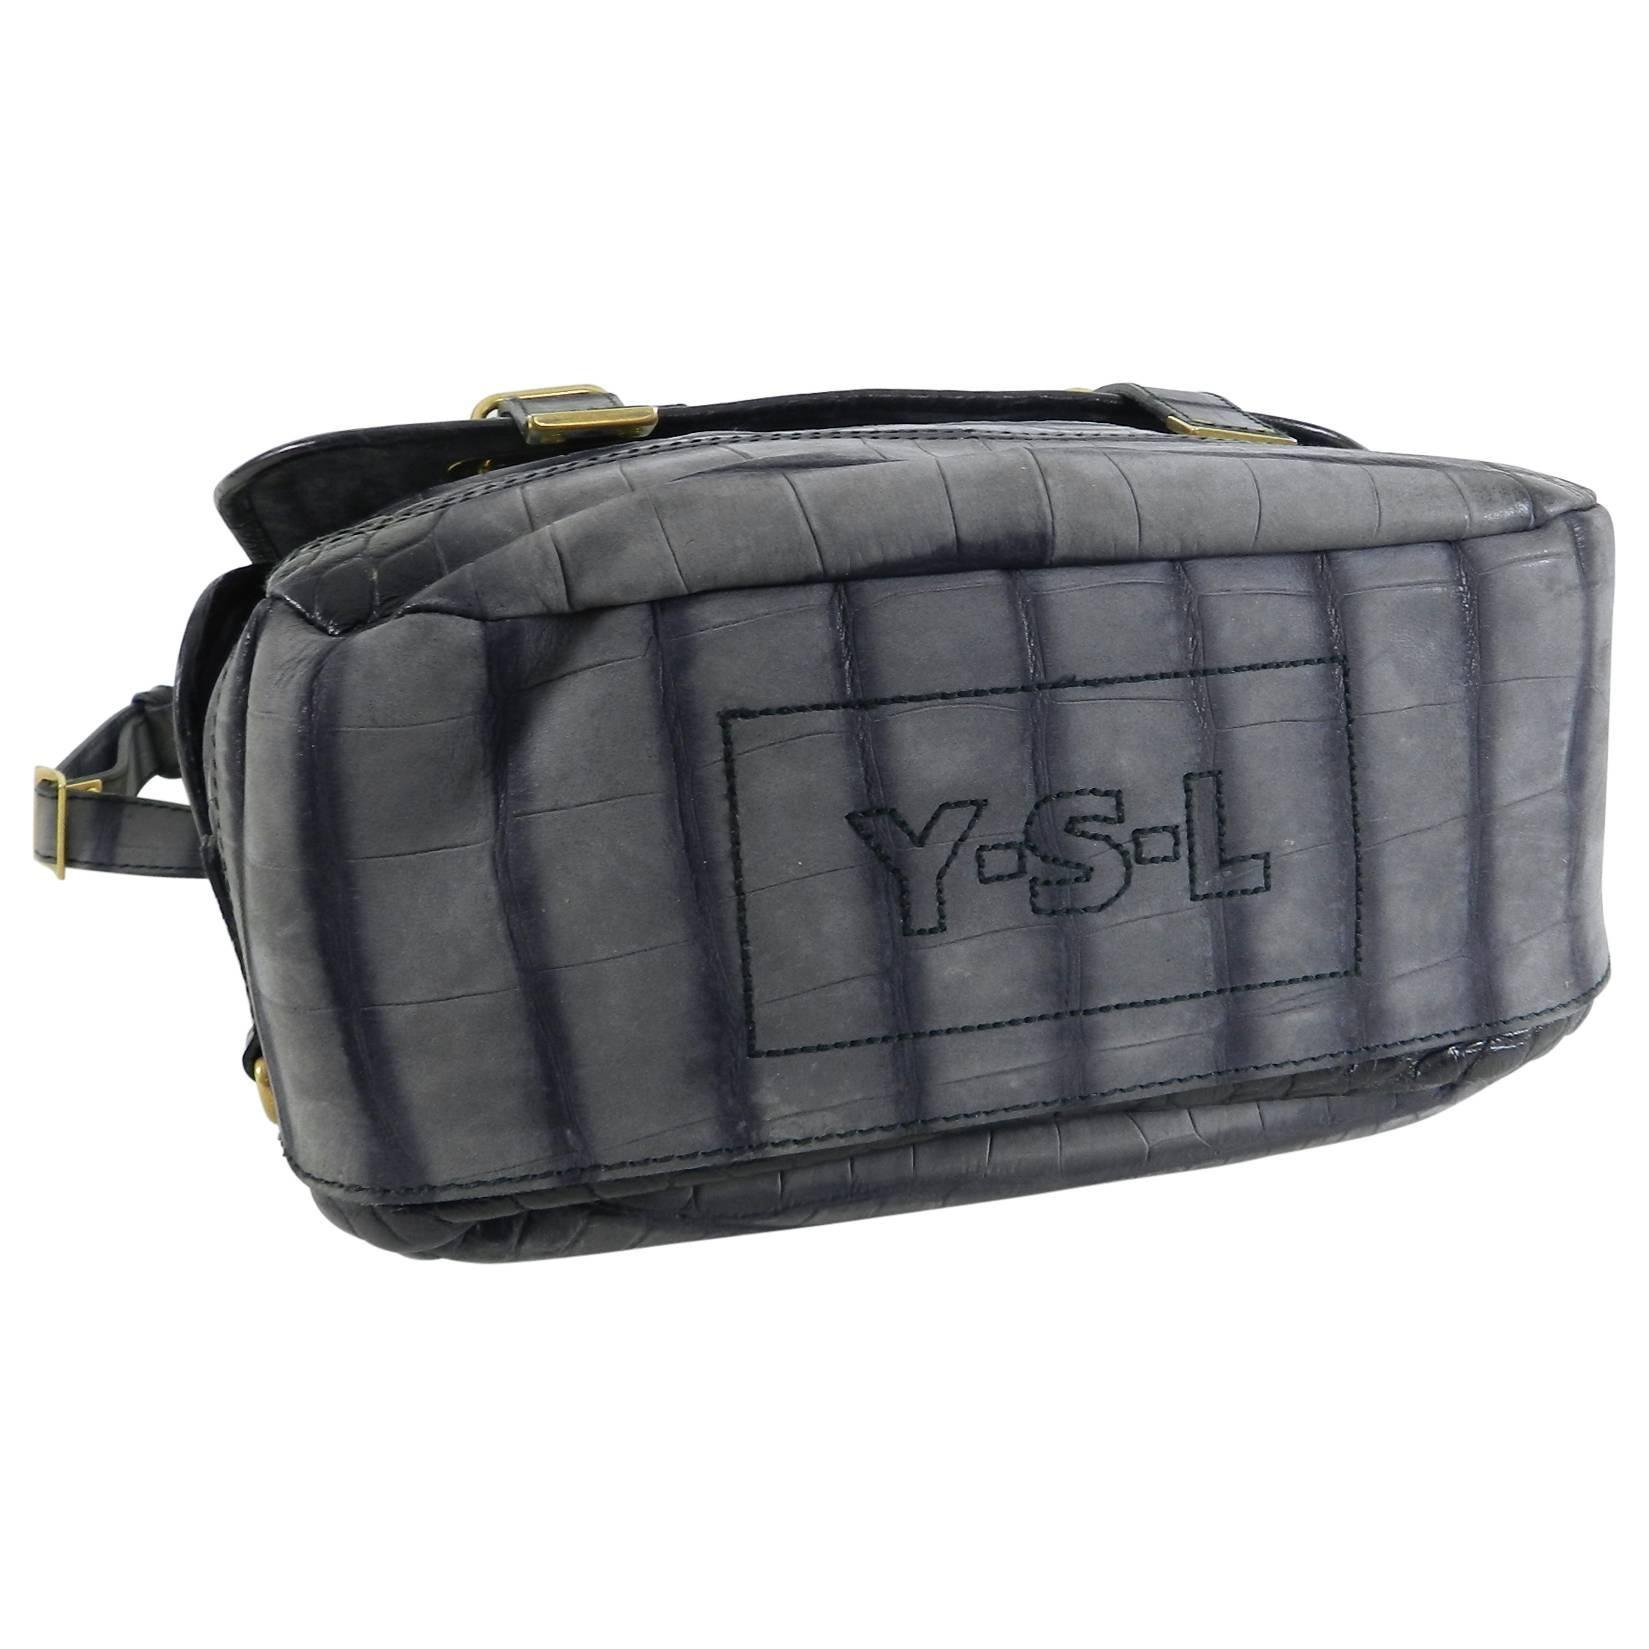 aa42c9abc083 Yves Saint Laurent YSL Grey Faux Crocodile Grained Shoulder Bag at 1stdibs